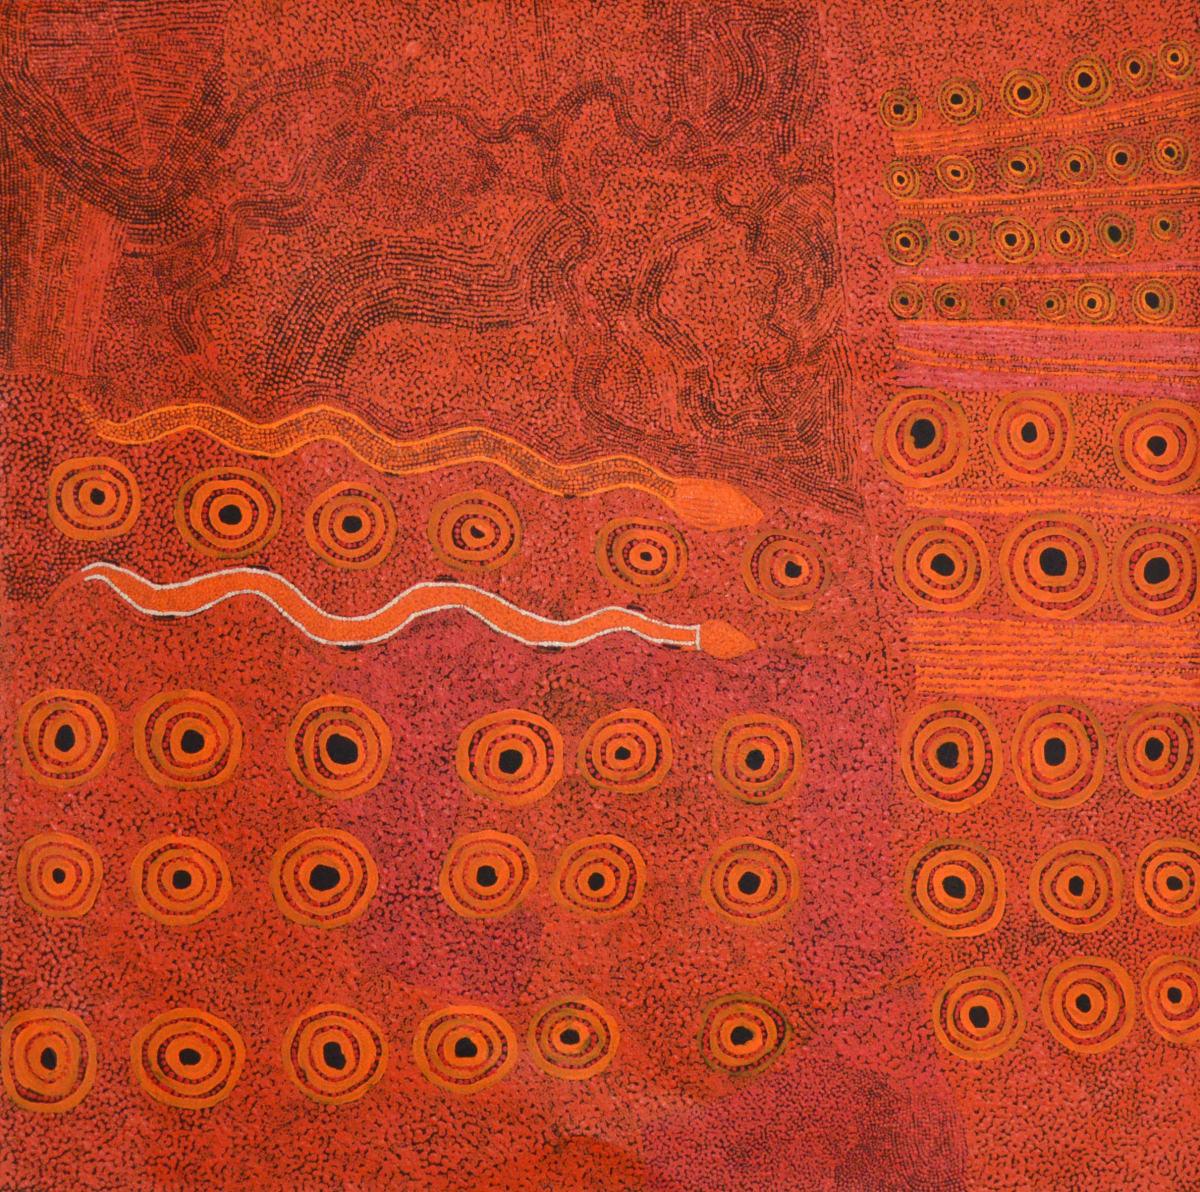 Ginger Wikilyiri Tali Tjukurpa 2014 acrylic on linen 100 x 100 cm